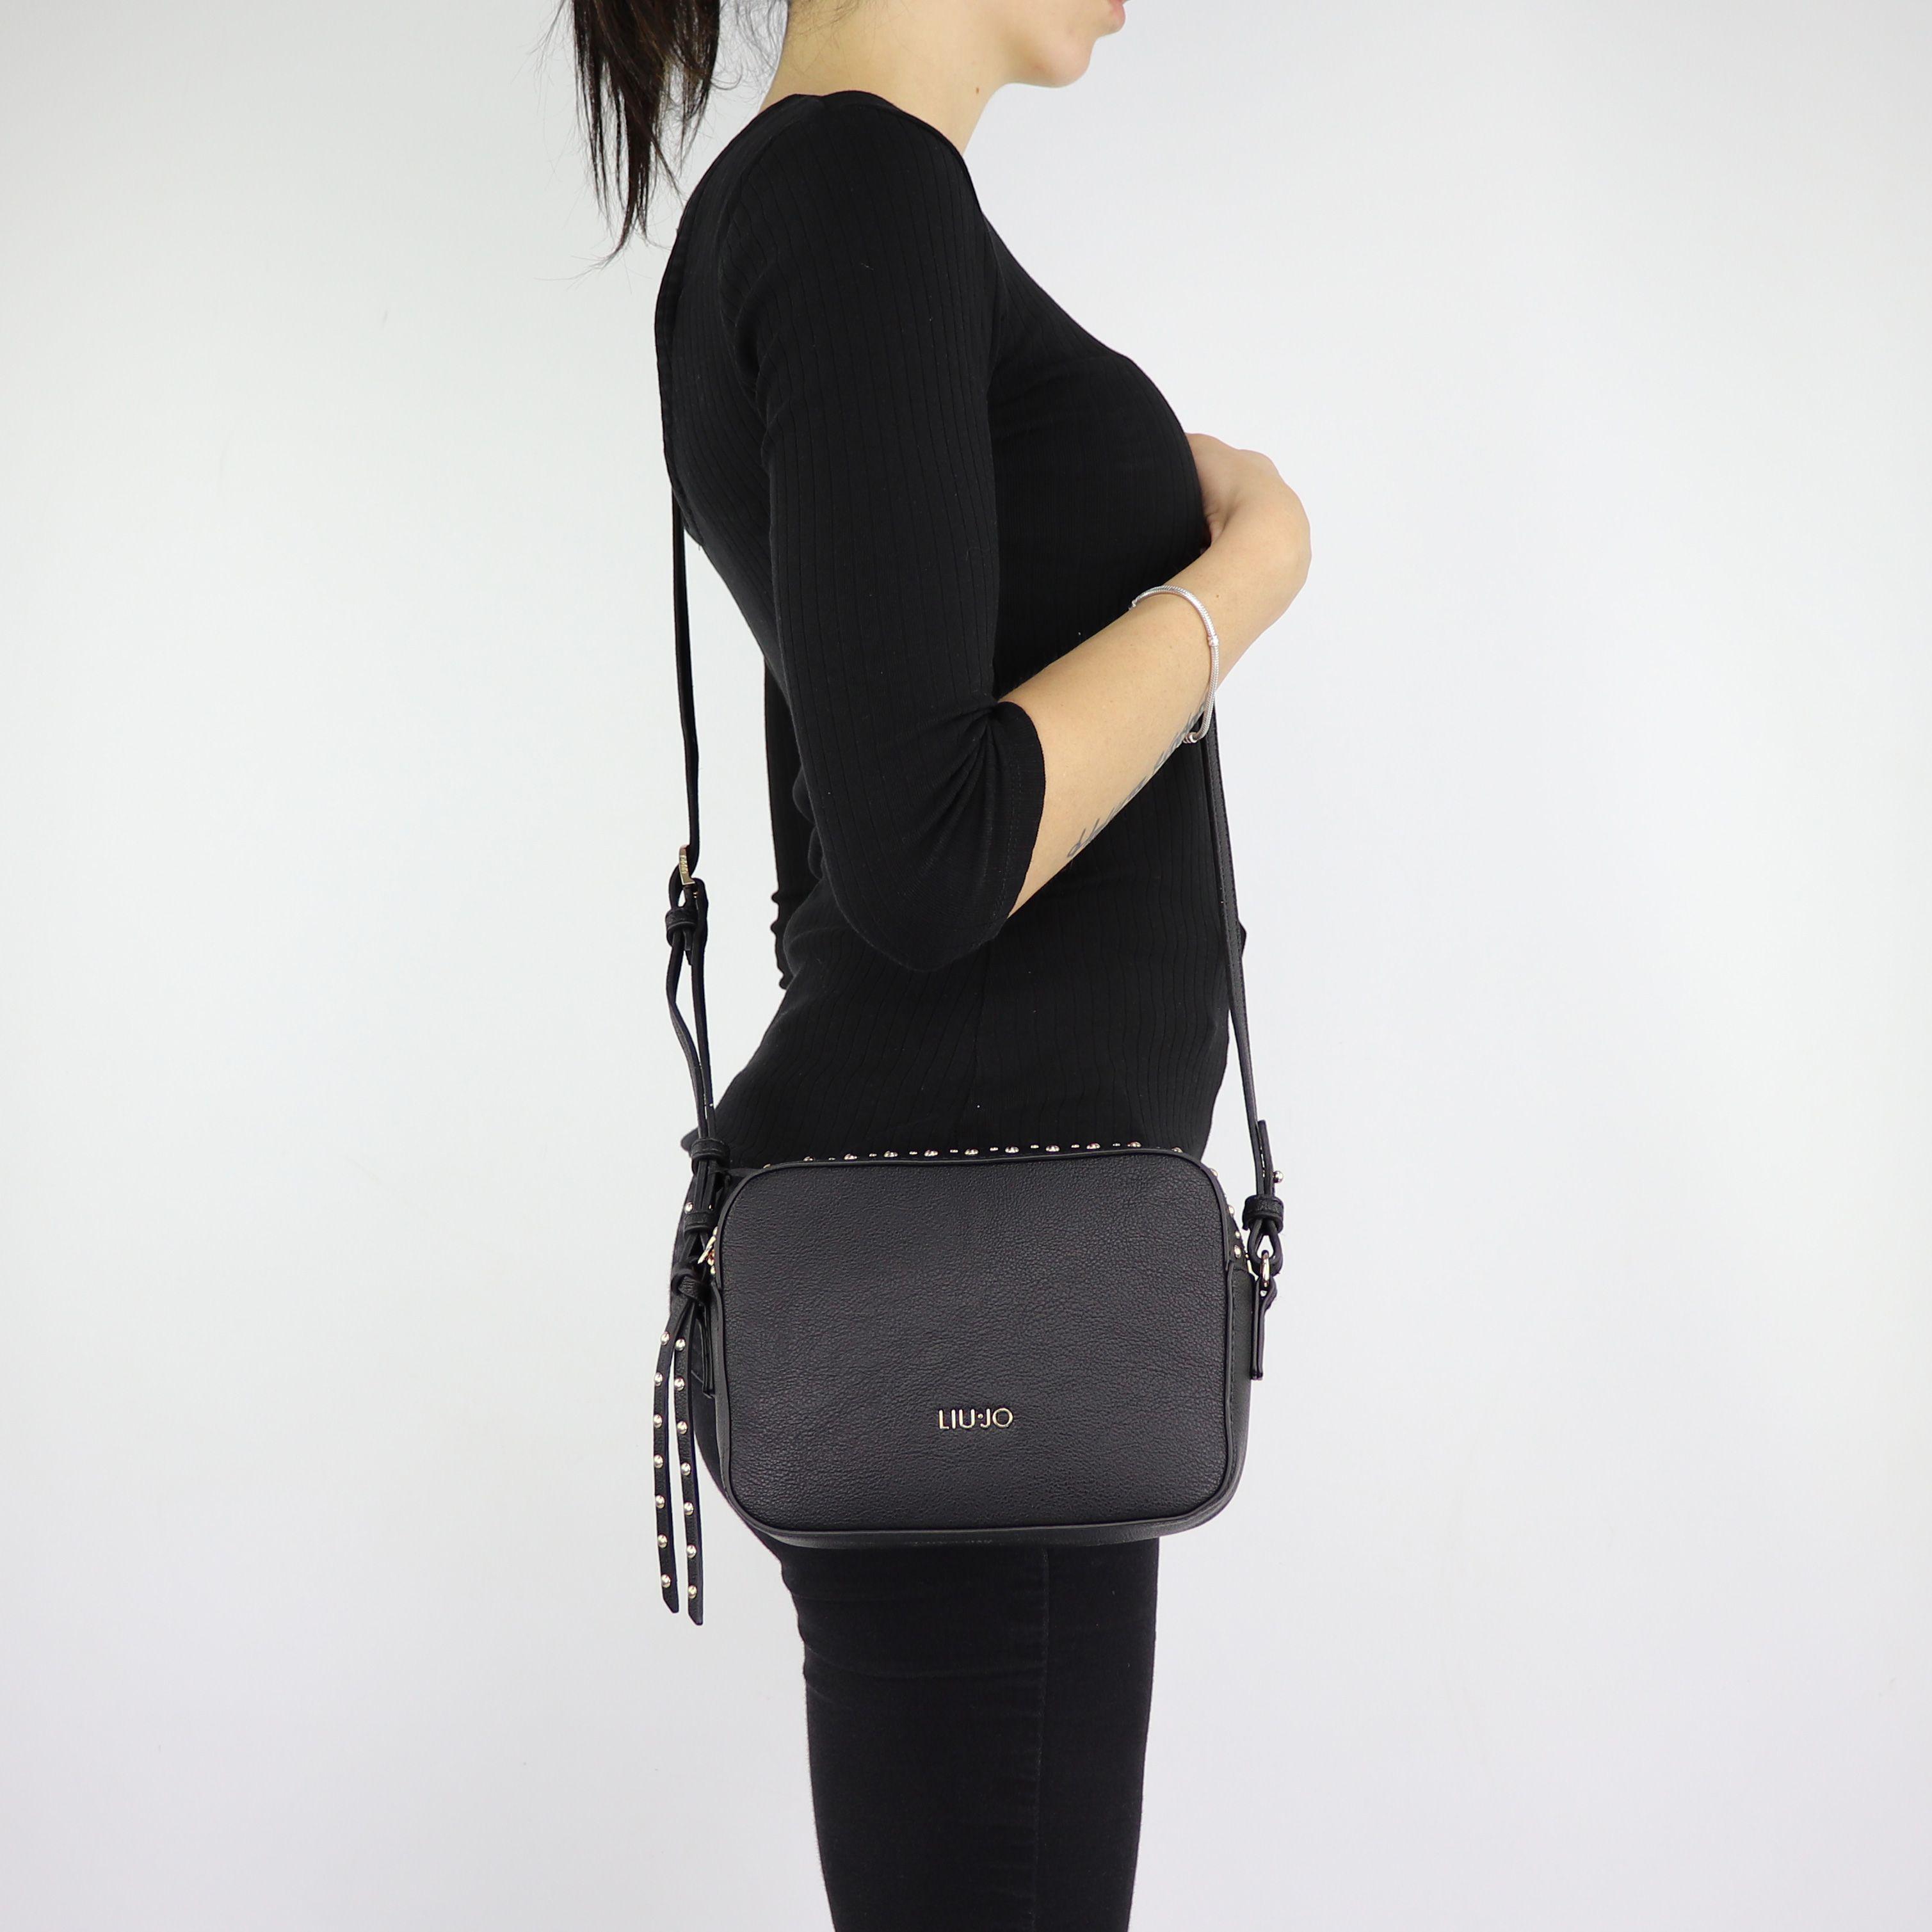 autentico a9ce0 eb63d Shoulder bag Liu Jo CrossBody Joy black size XS A68056 E0033